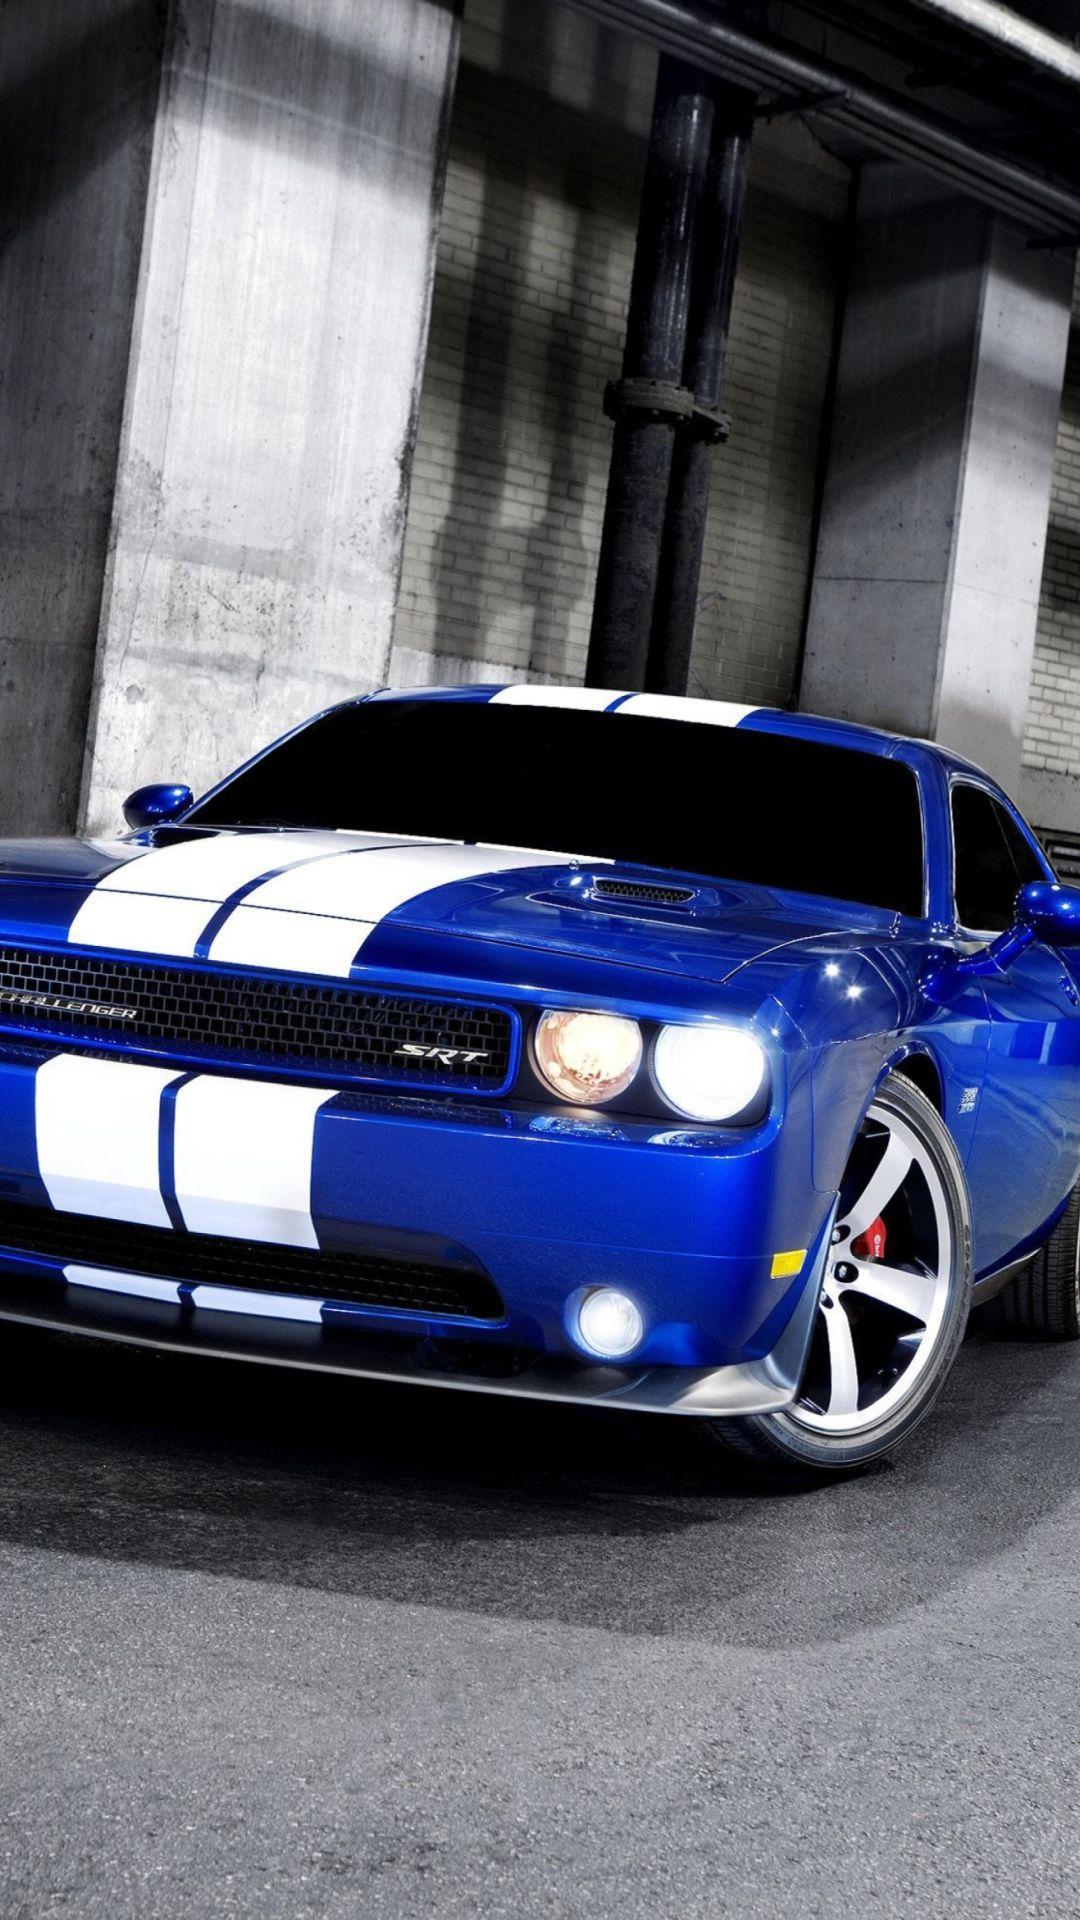 Dodge Challenger Srt Wallpaper For Iphone Plus